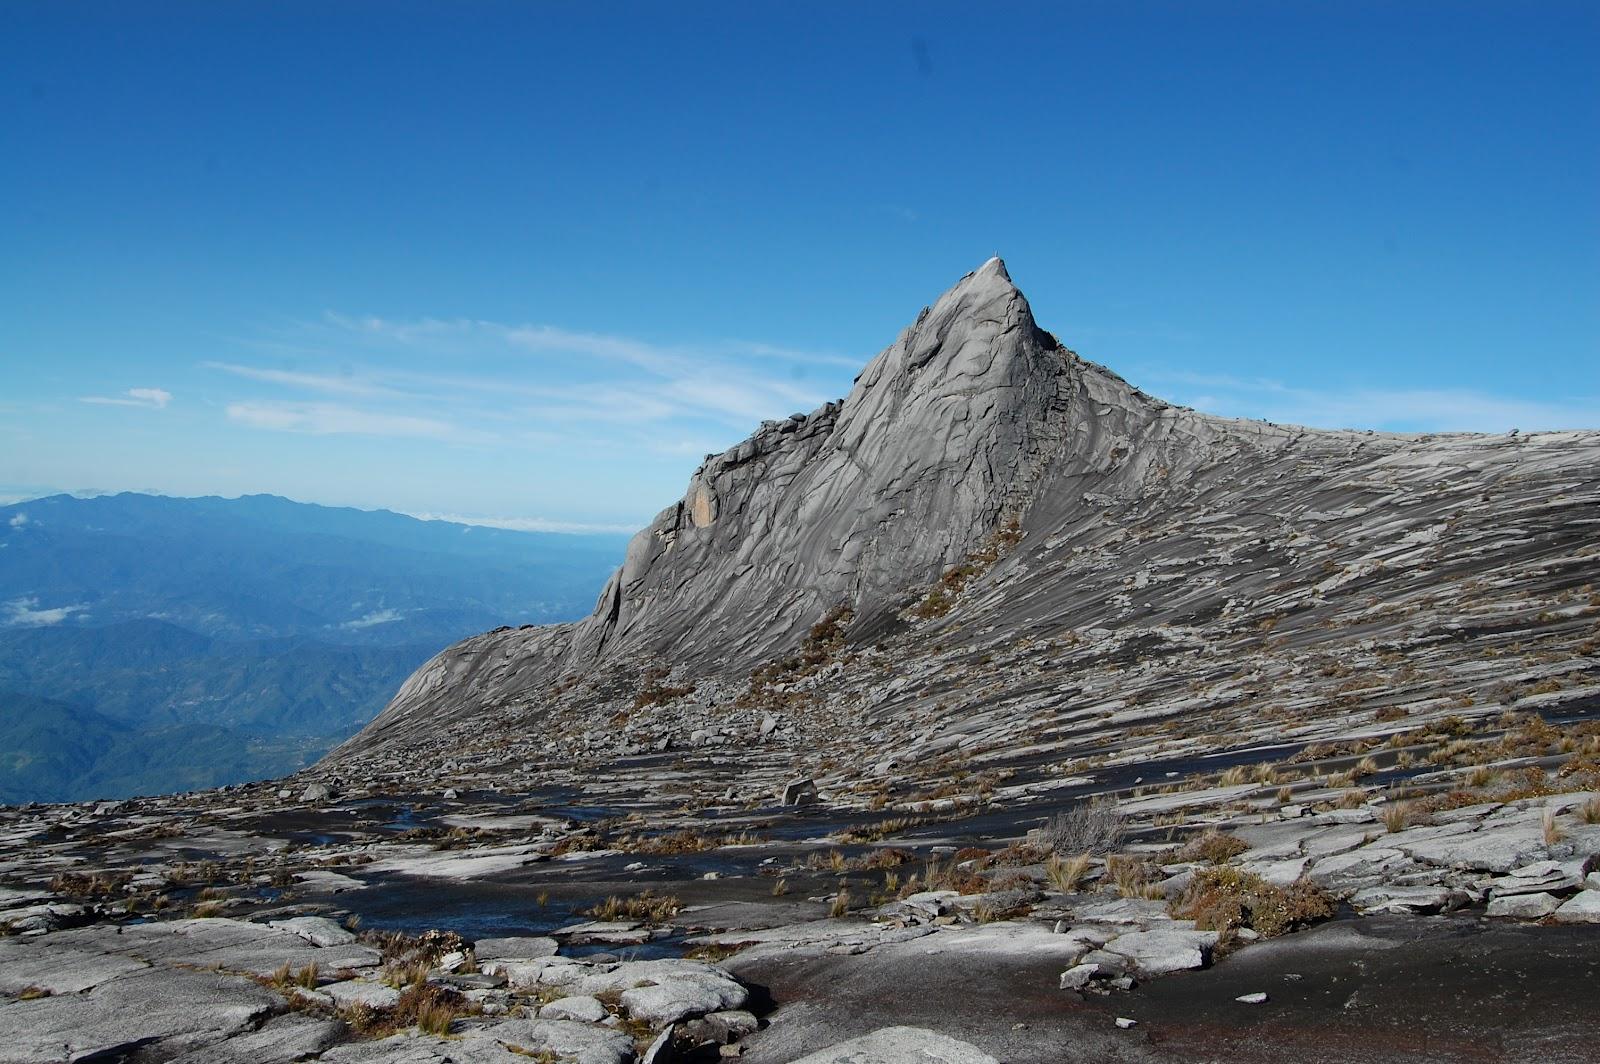 Harga Pakej Mendaki Gunung Kinabalu - Dihentikan